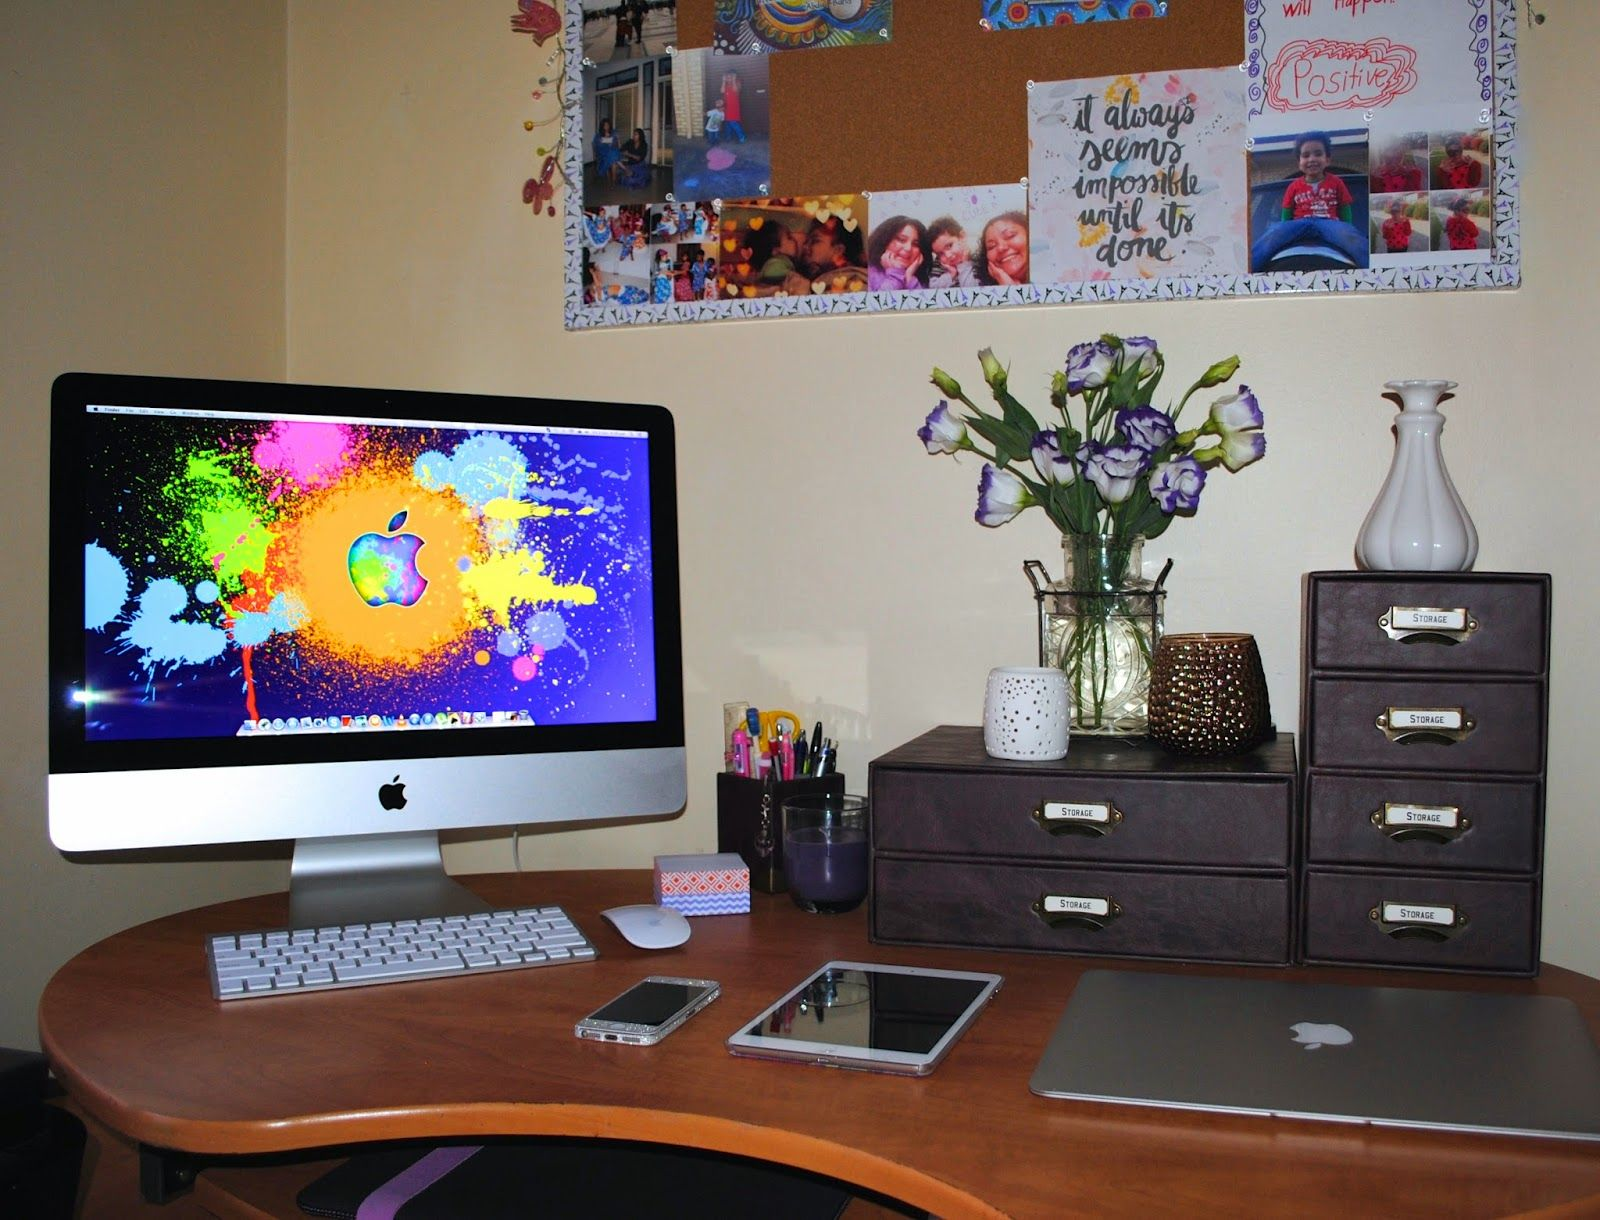 Sabby S Home Office Mac Setup Mac Setup Imac Apple Hardware